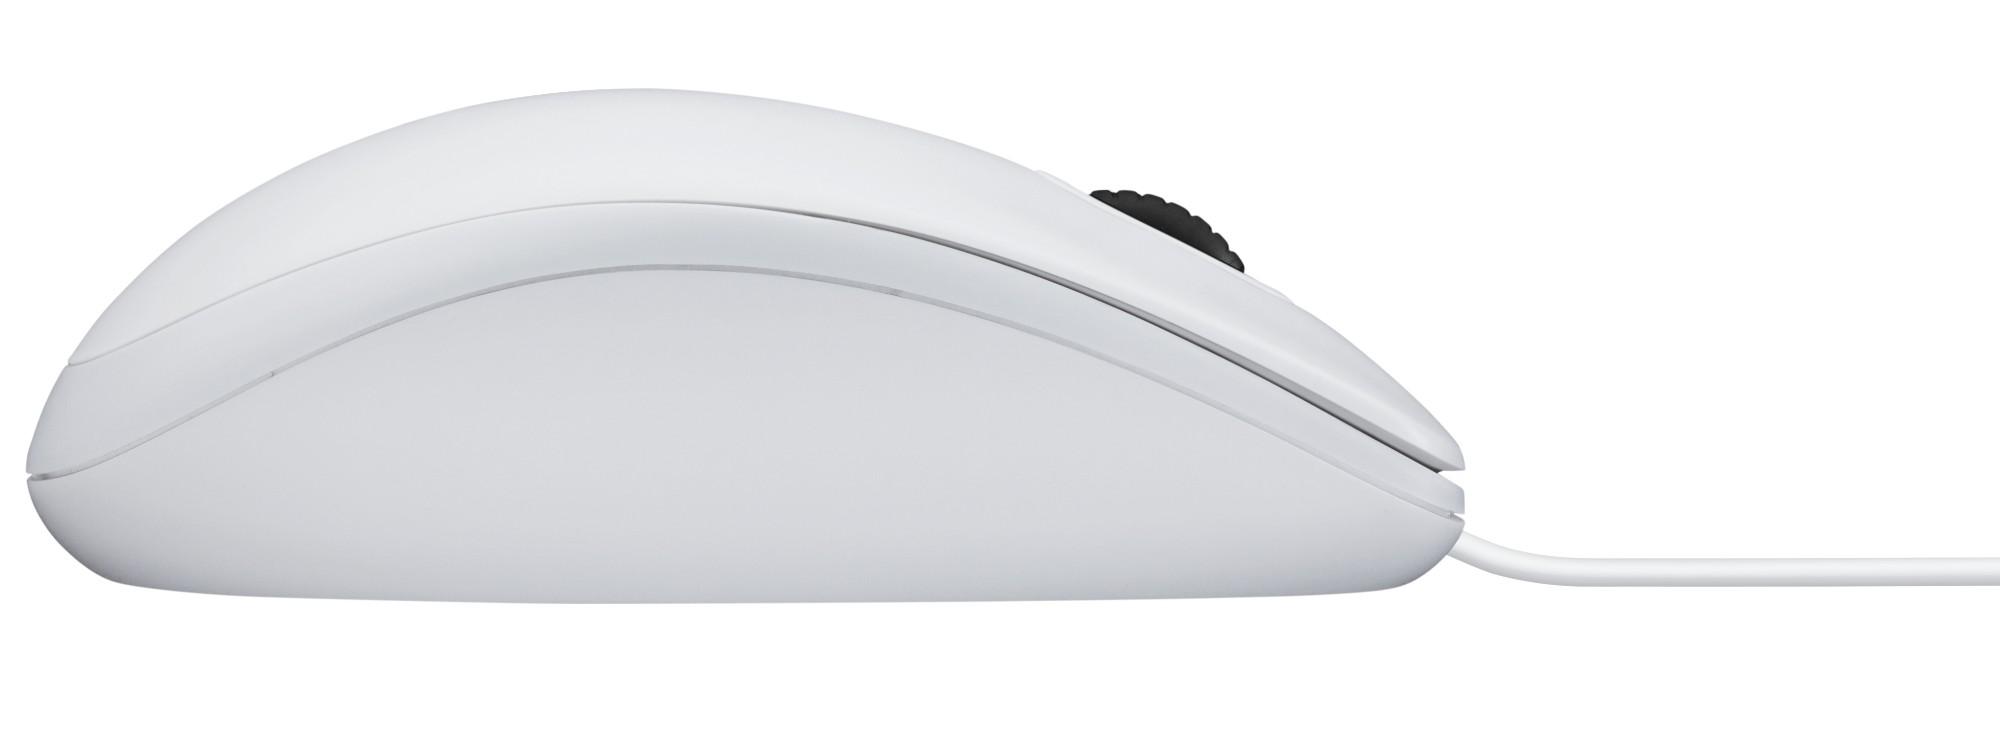 Logitech B100 Mice Usb Optical 800 Dpi Ambidextrous White Digital Mouse Outlet